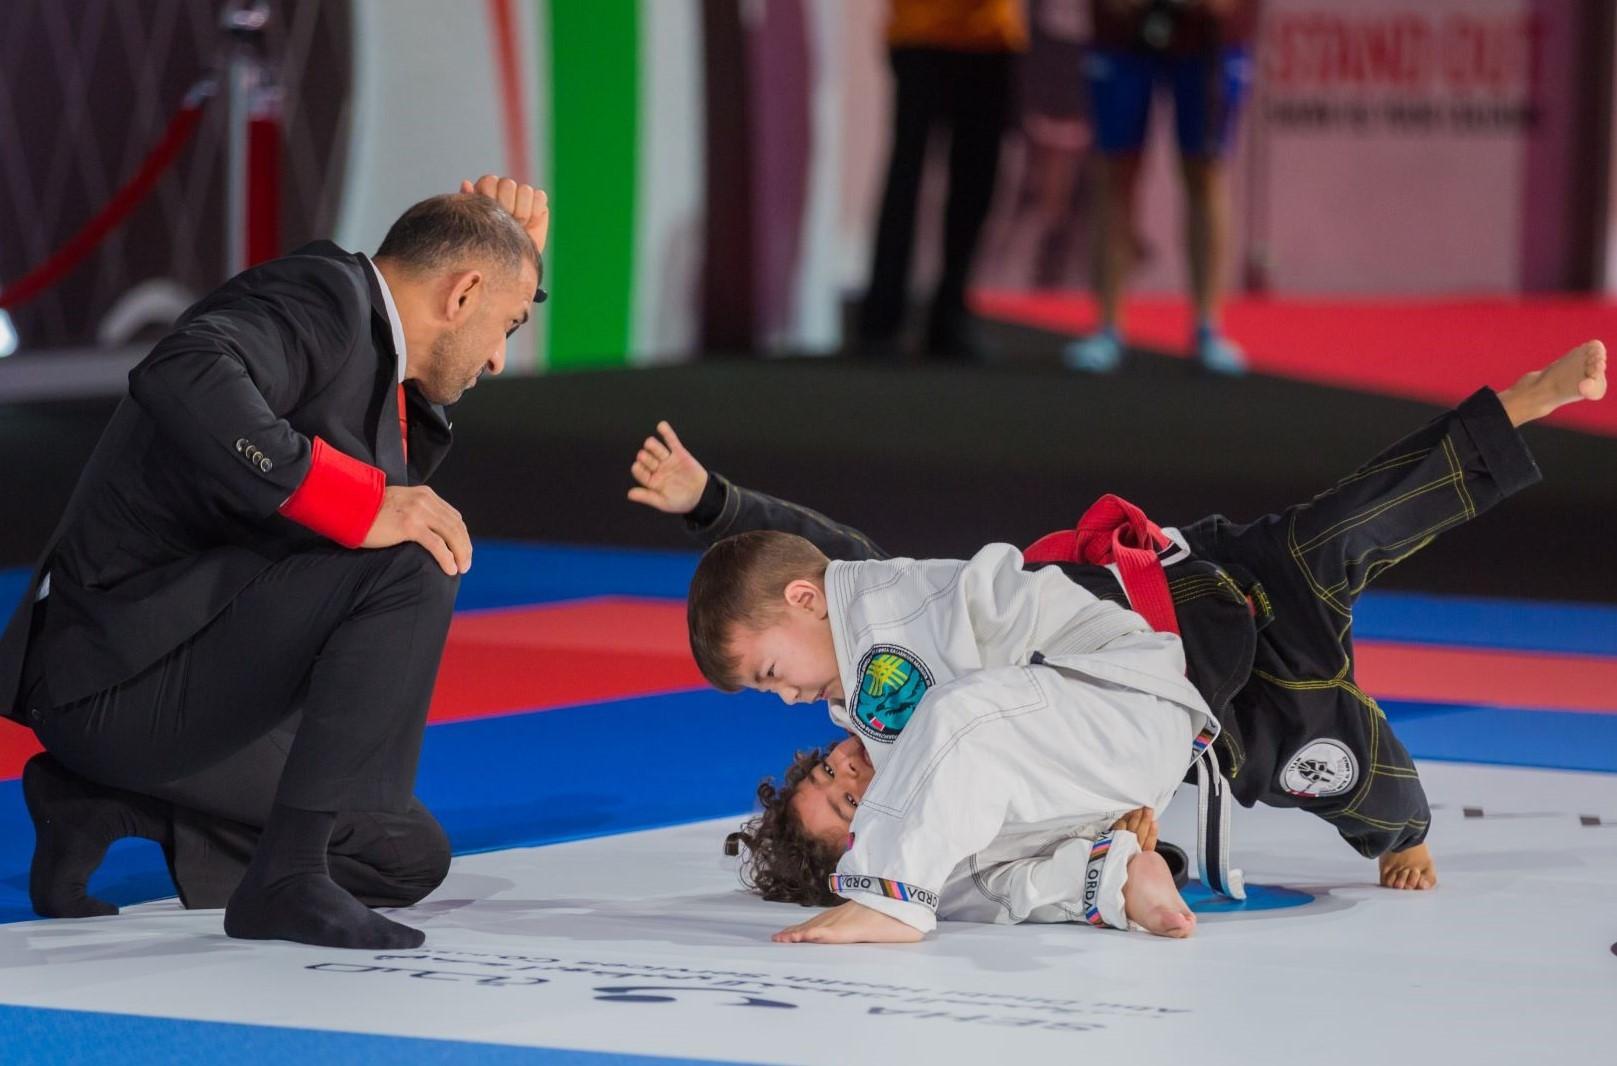 abu dhabi world professional jiu-jitsu championship shows jiu-jitsu is a sport for all 1.jpg